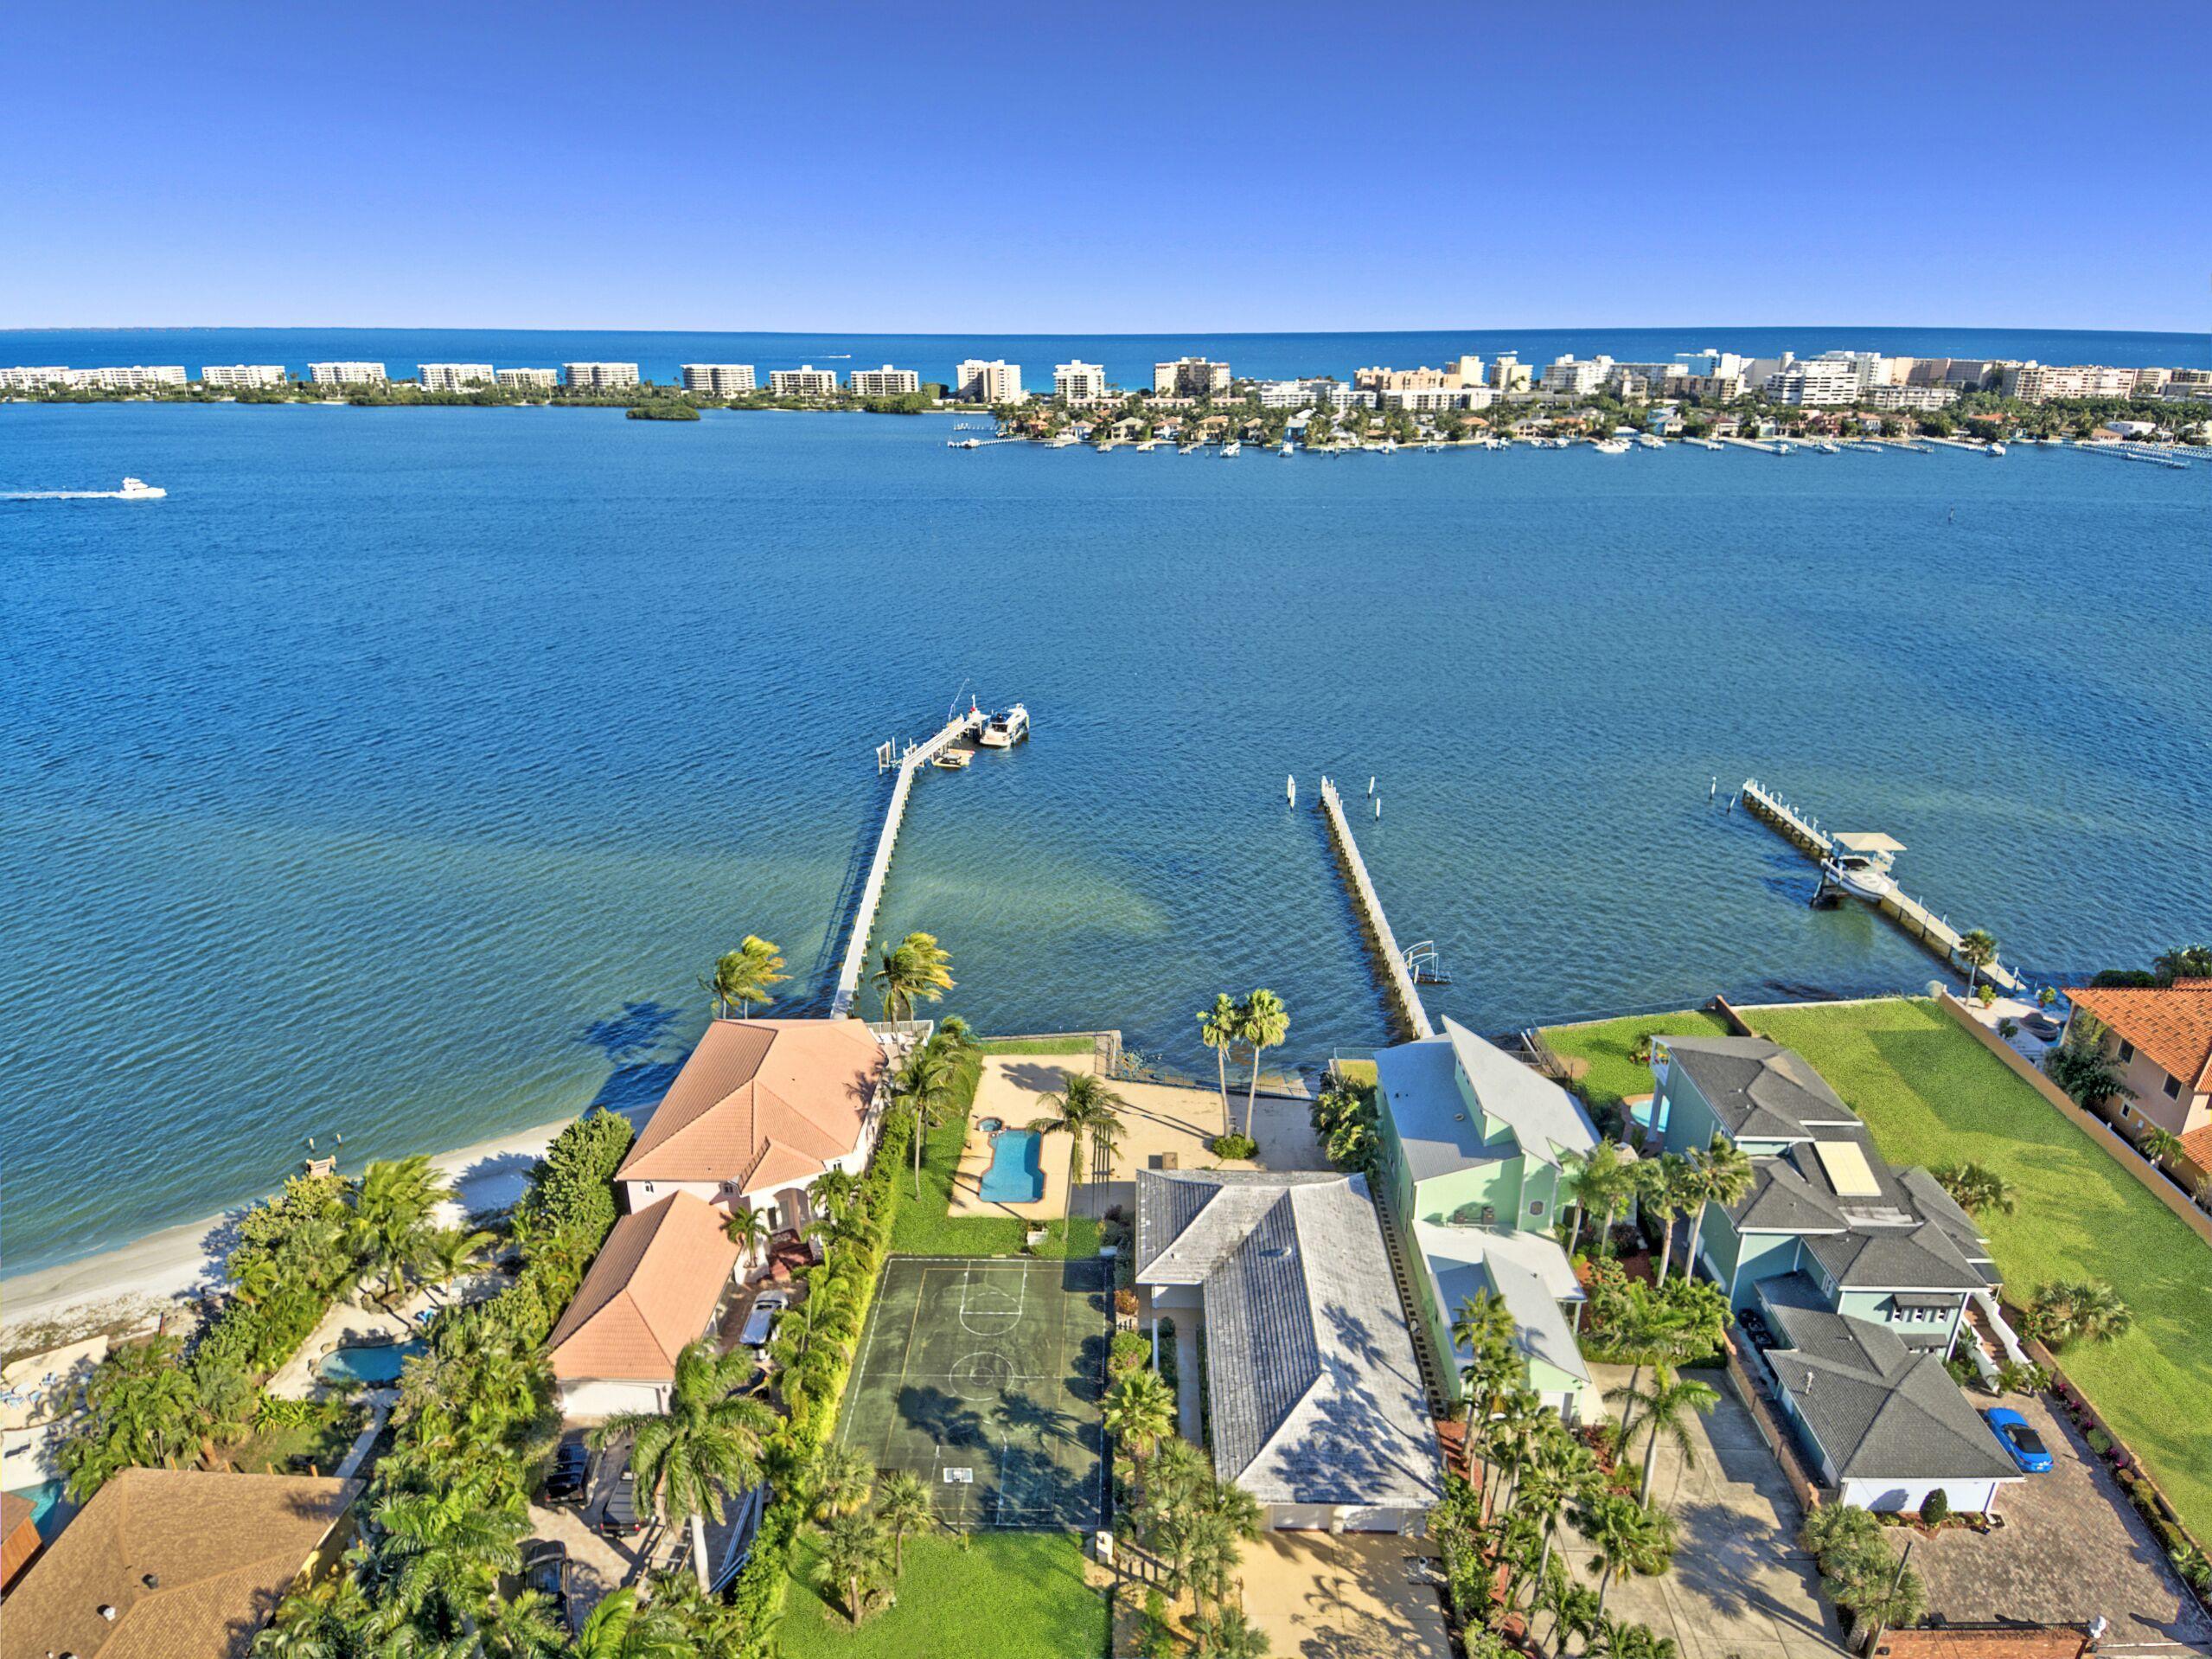 18 Intracoastal Way - Lake Worth, Florida